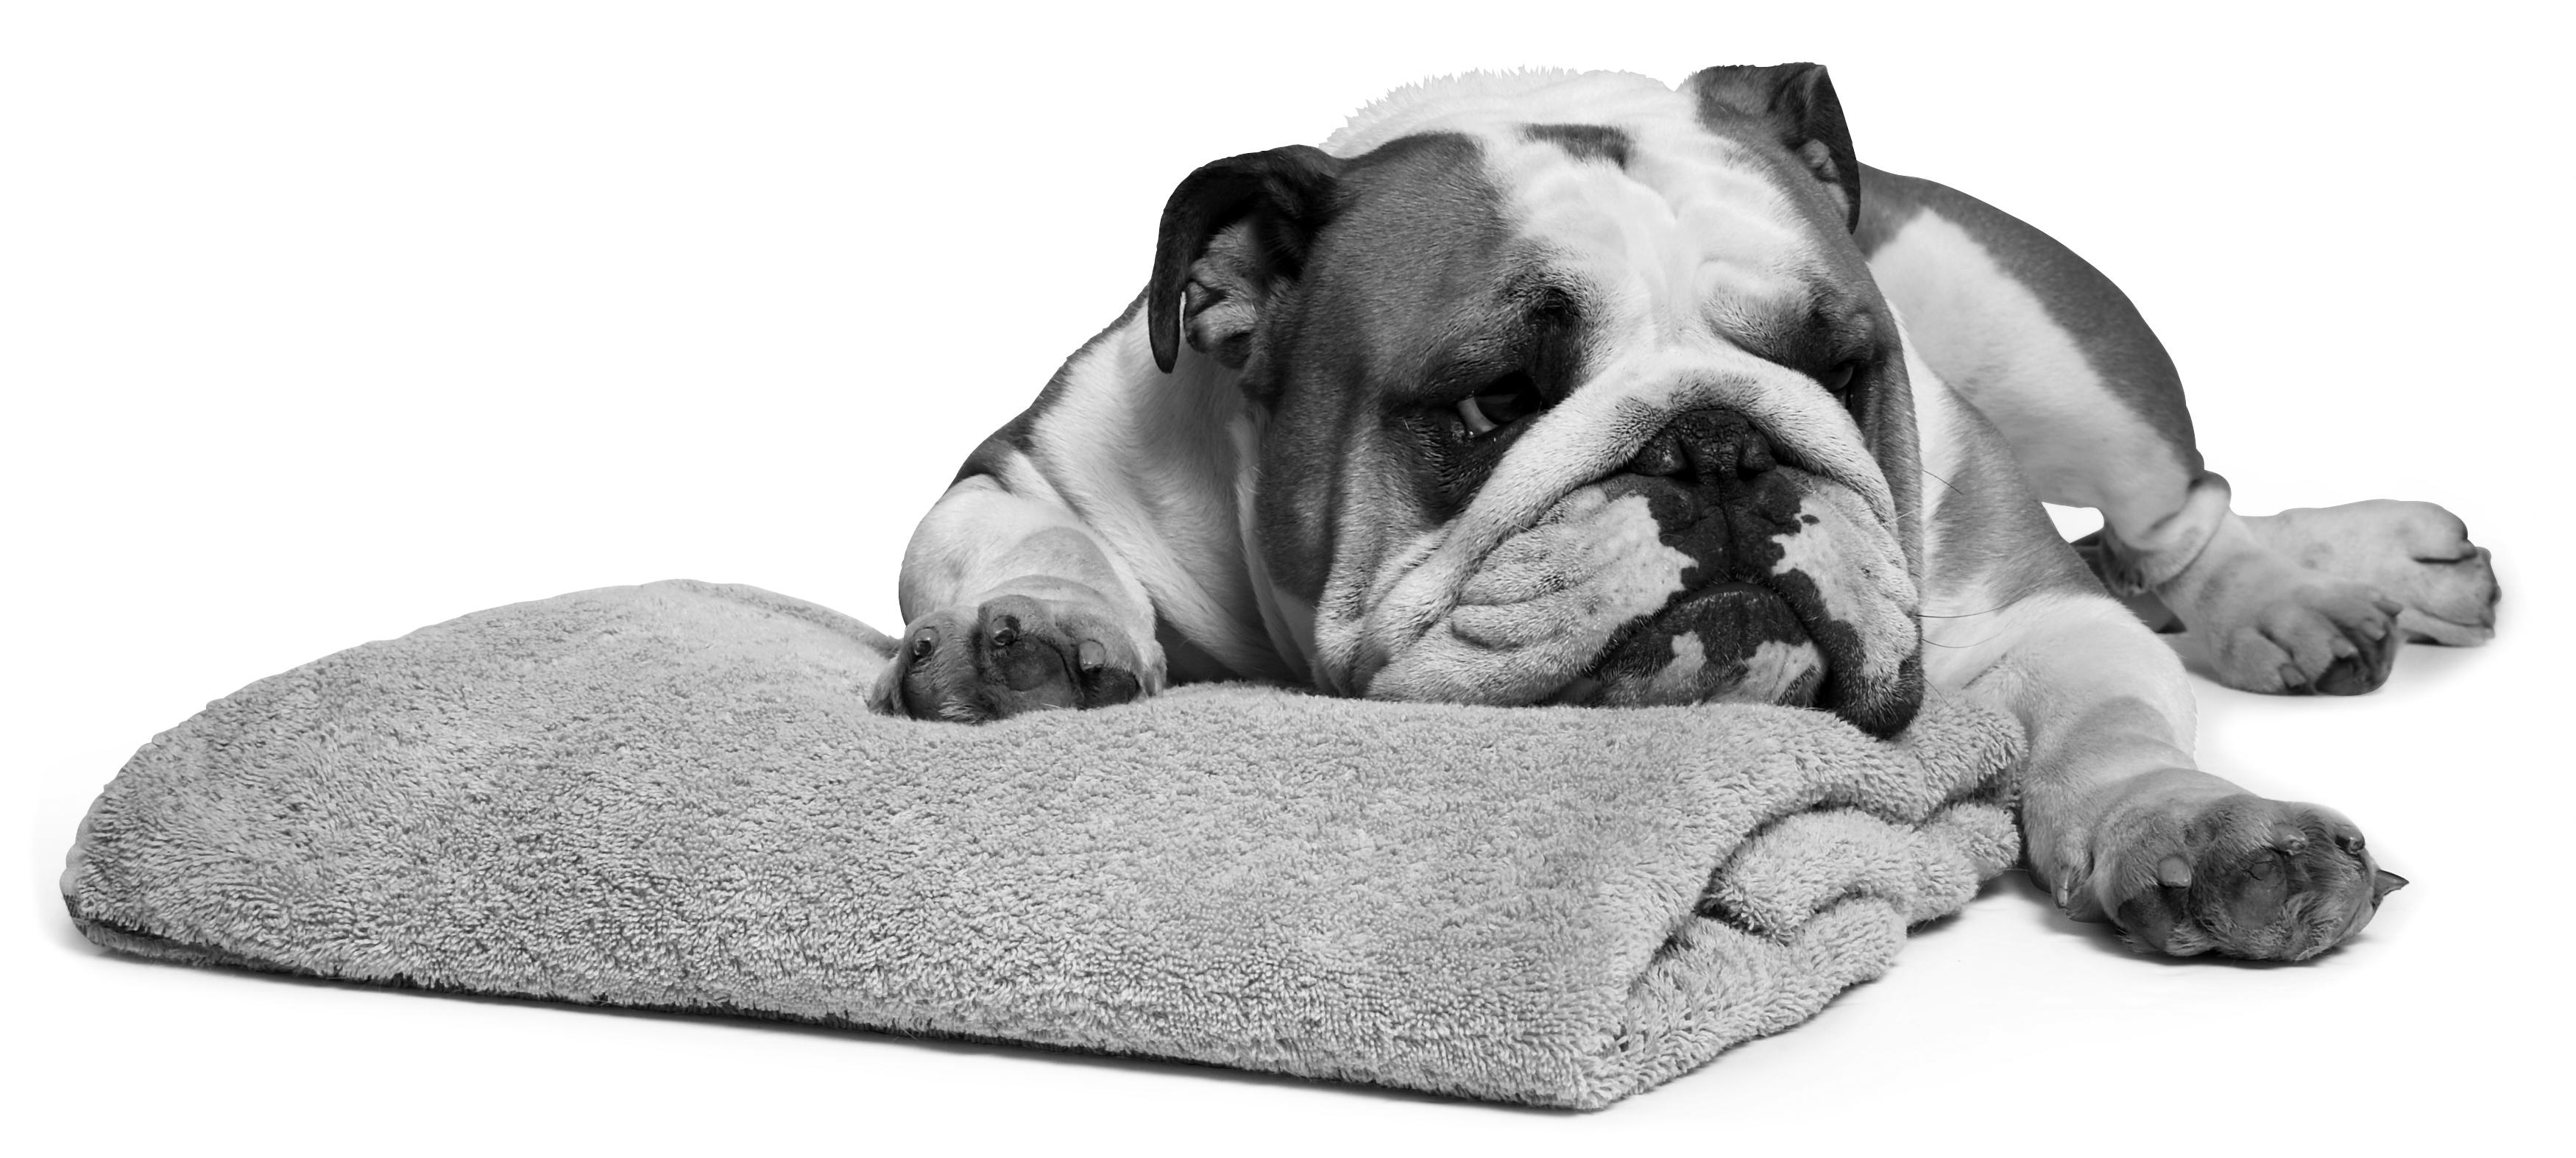 Bulldog_On_Towel_BandW_Contrast